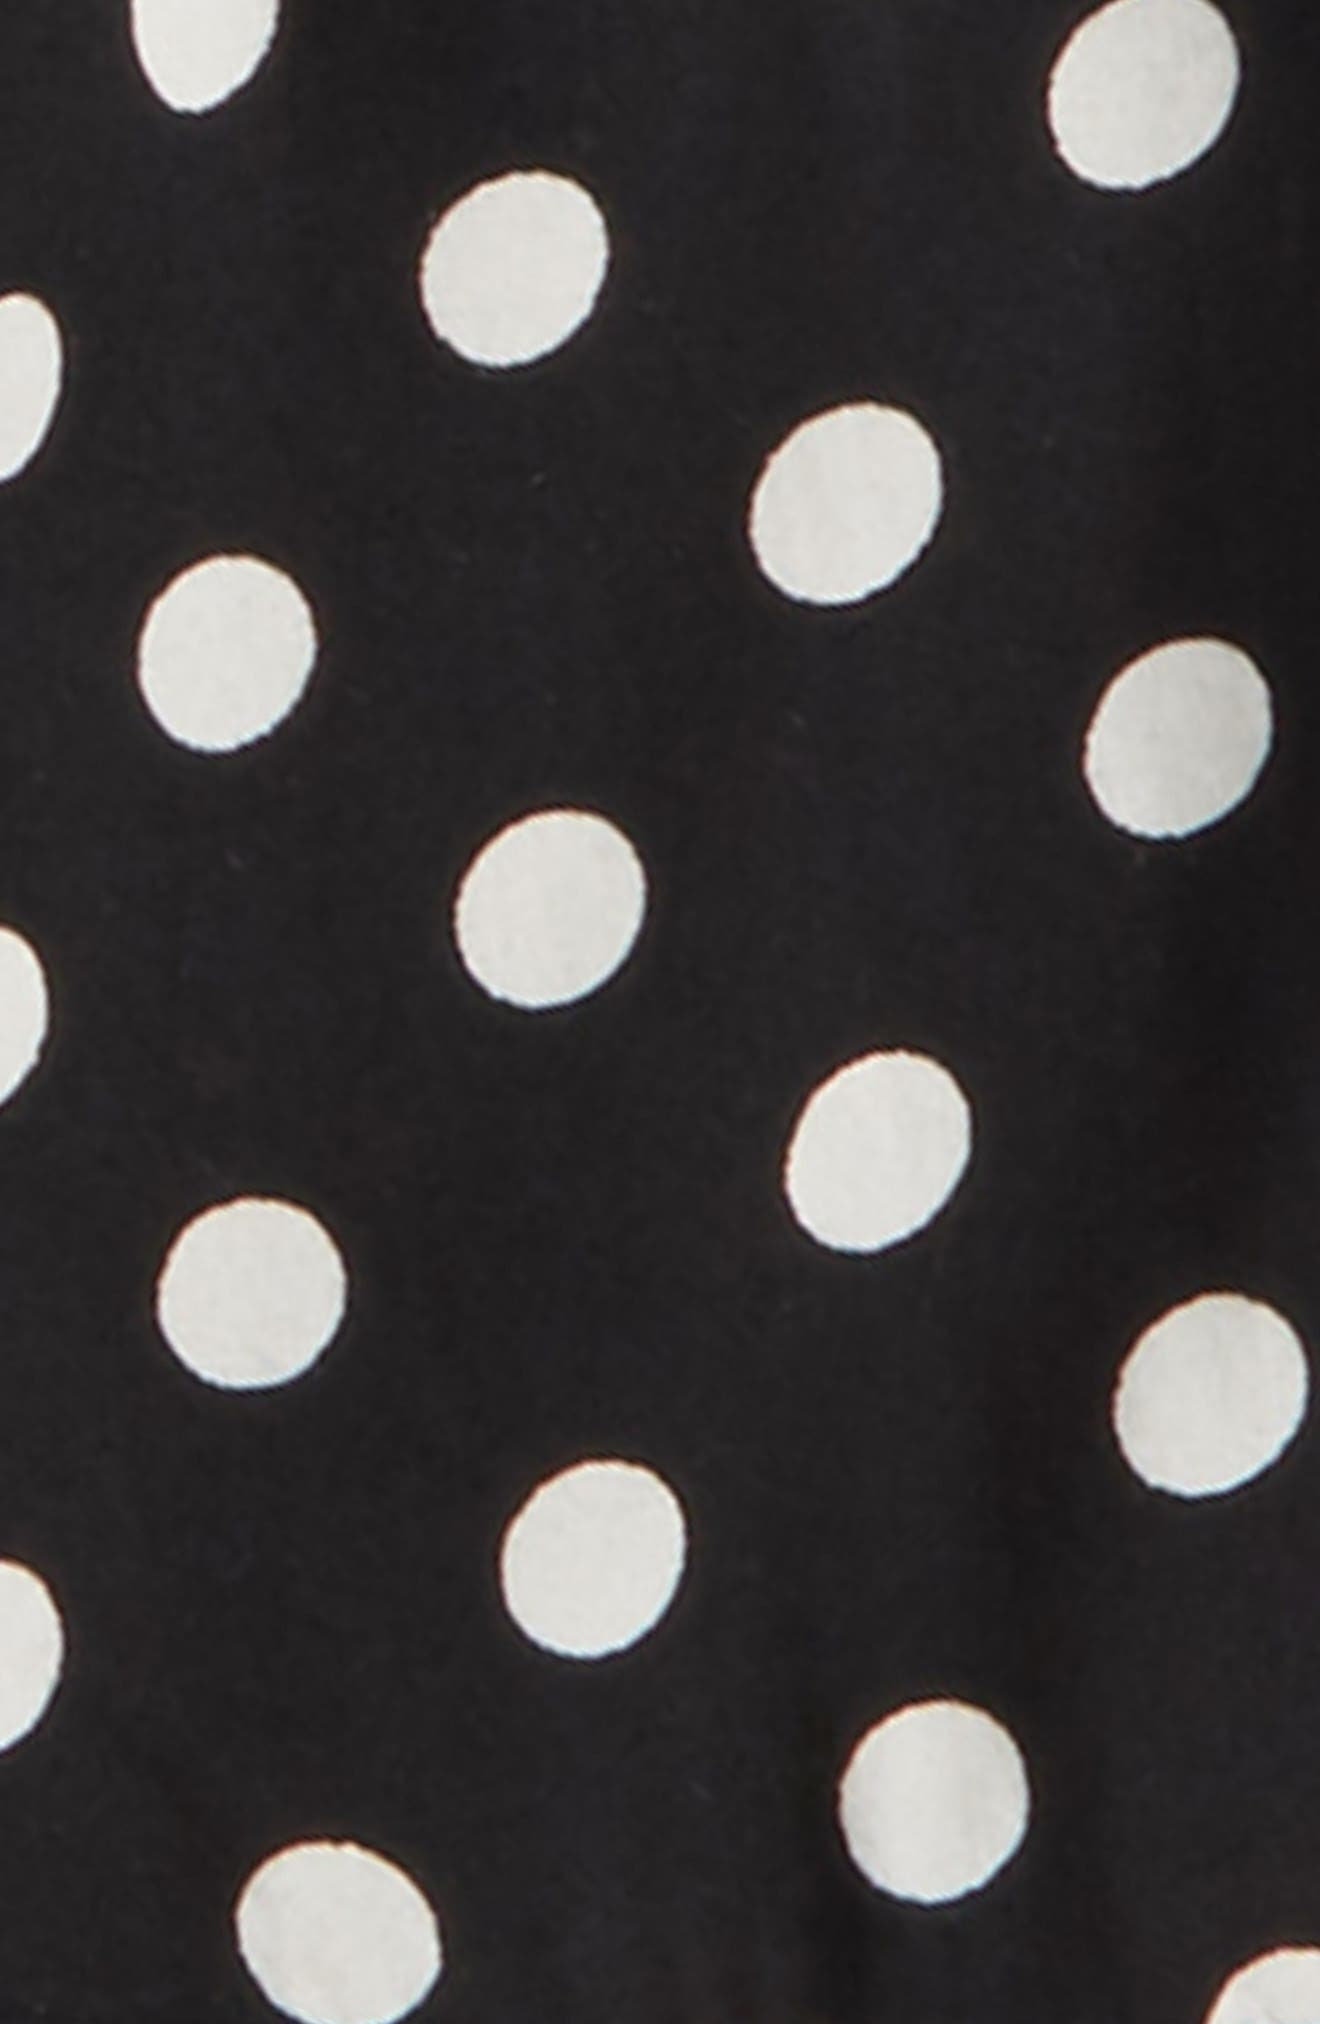 Polka Dot Bell Sleeve Top,                             Alternate thumbnail 2, color,                             Black/ Ivory